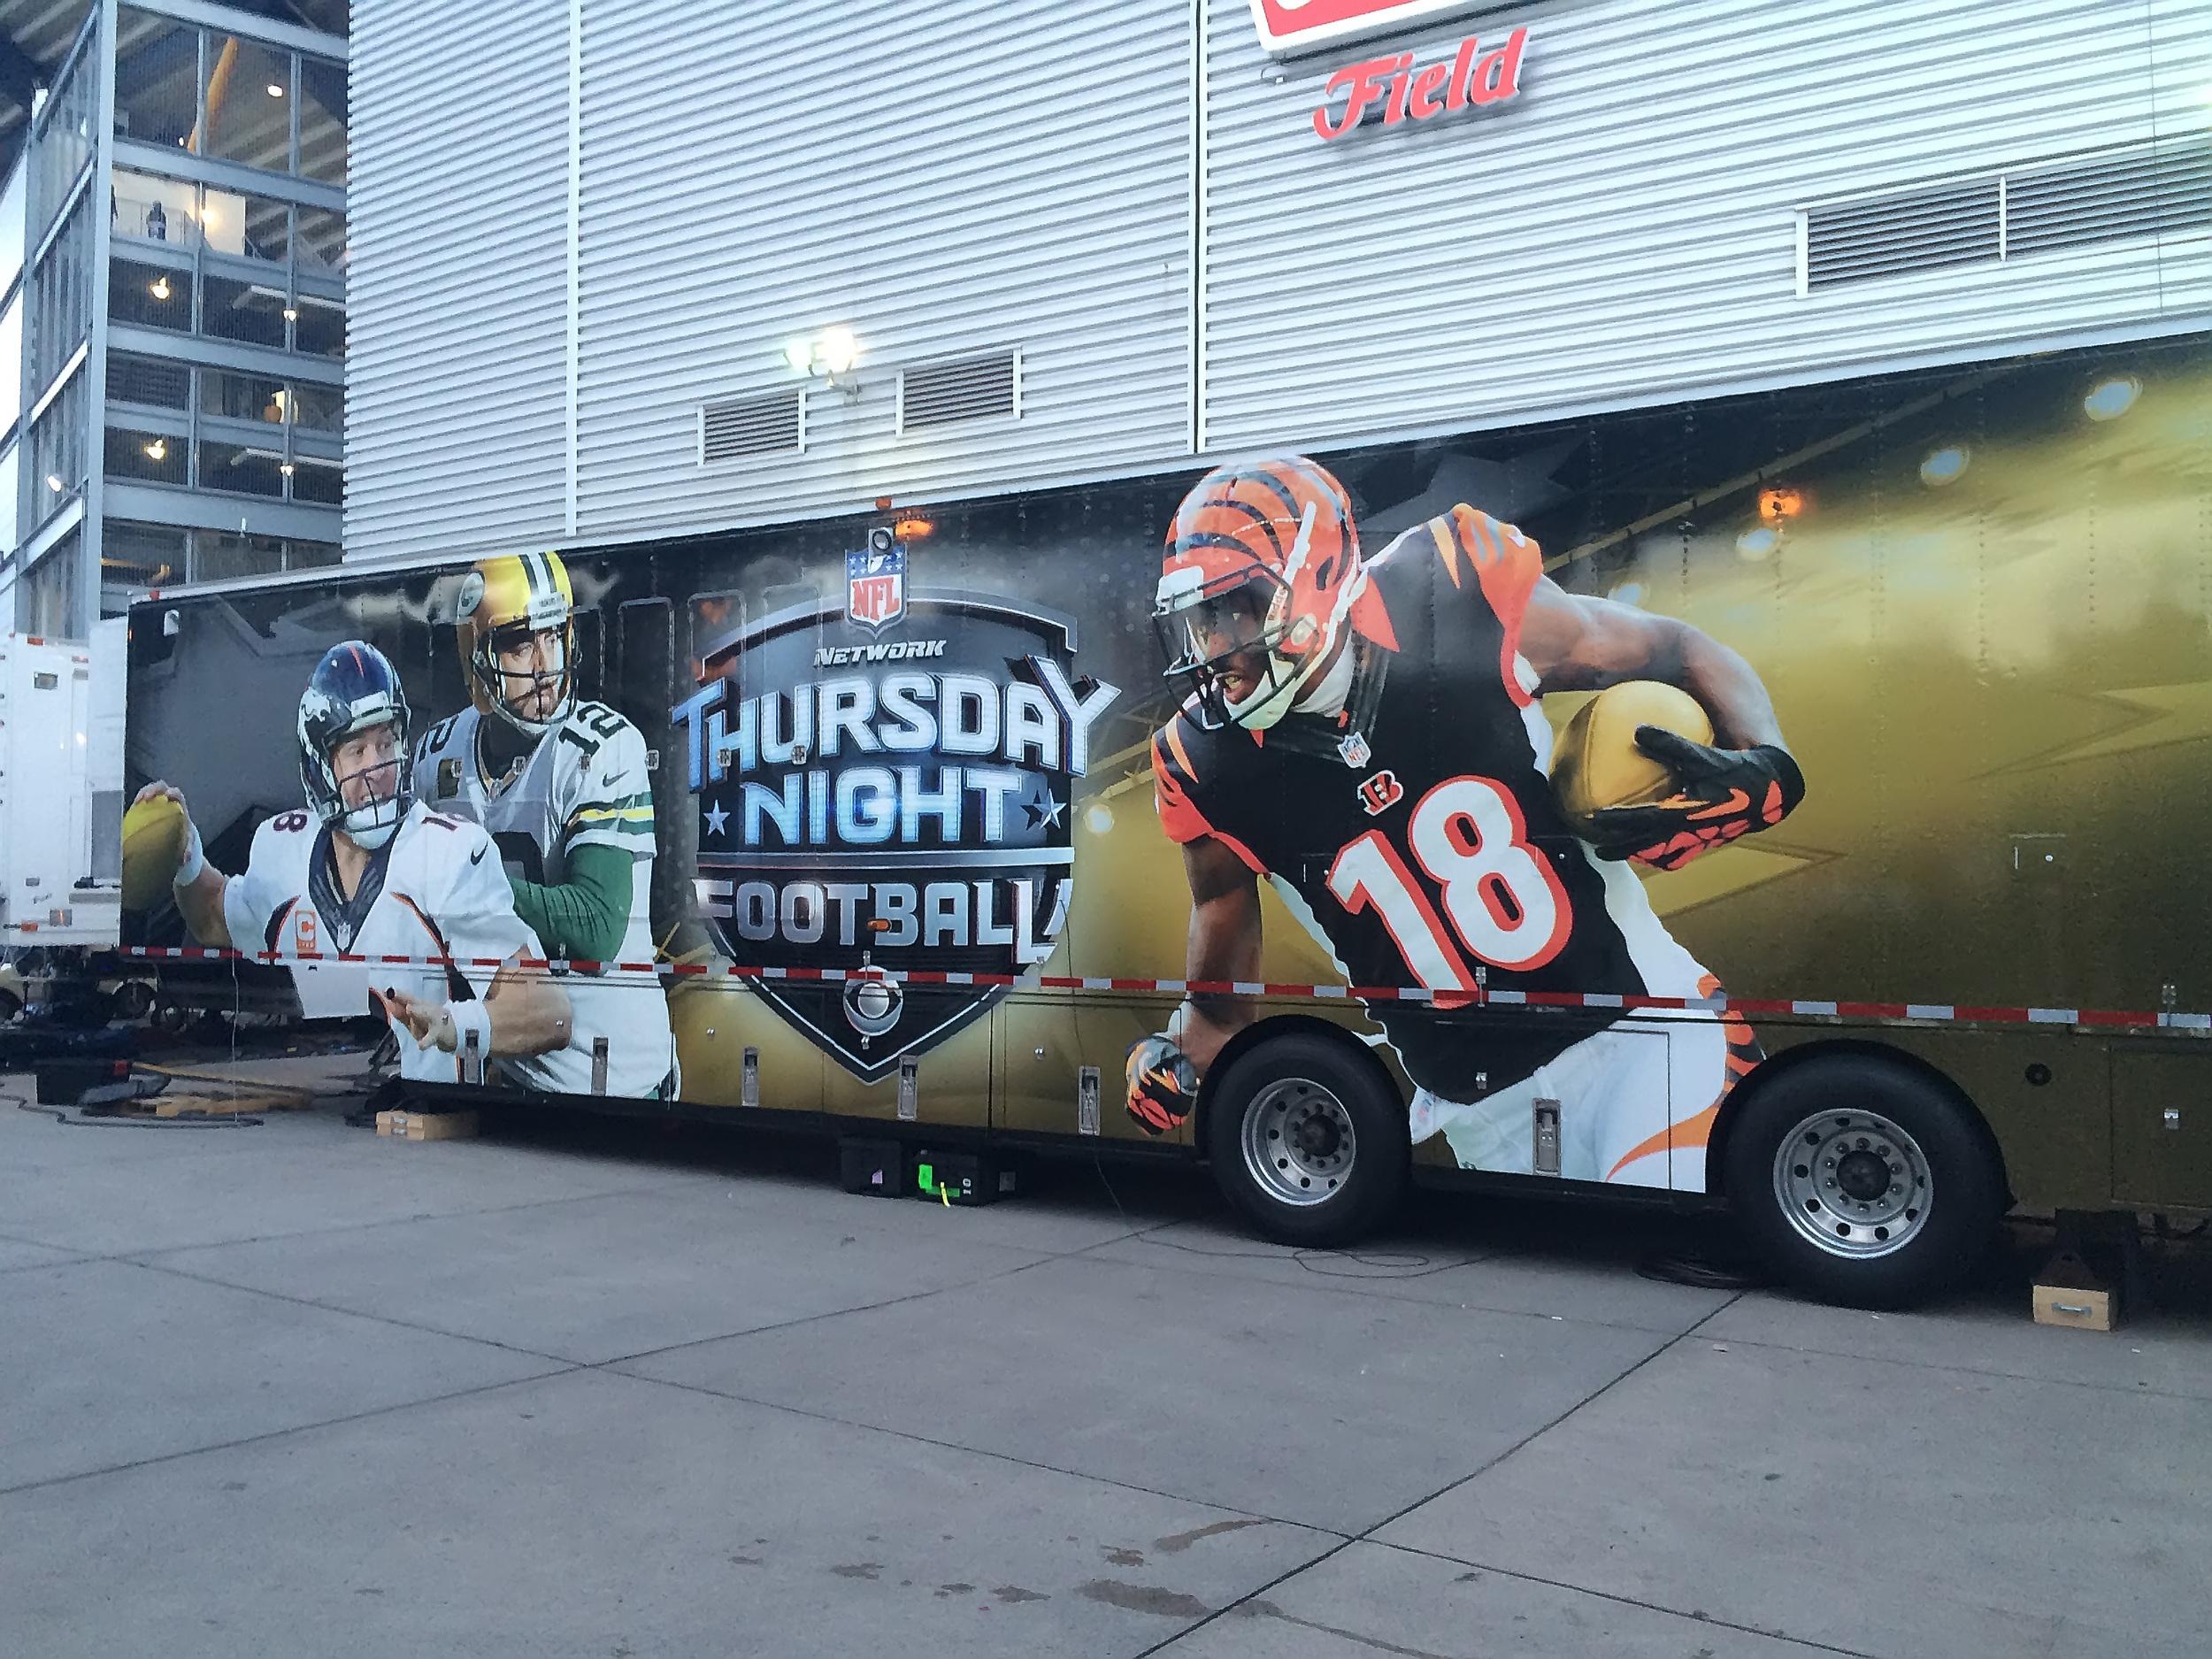 CBS Thursday Night Football truck (taken with my iPhone)